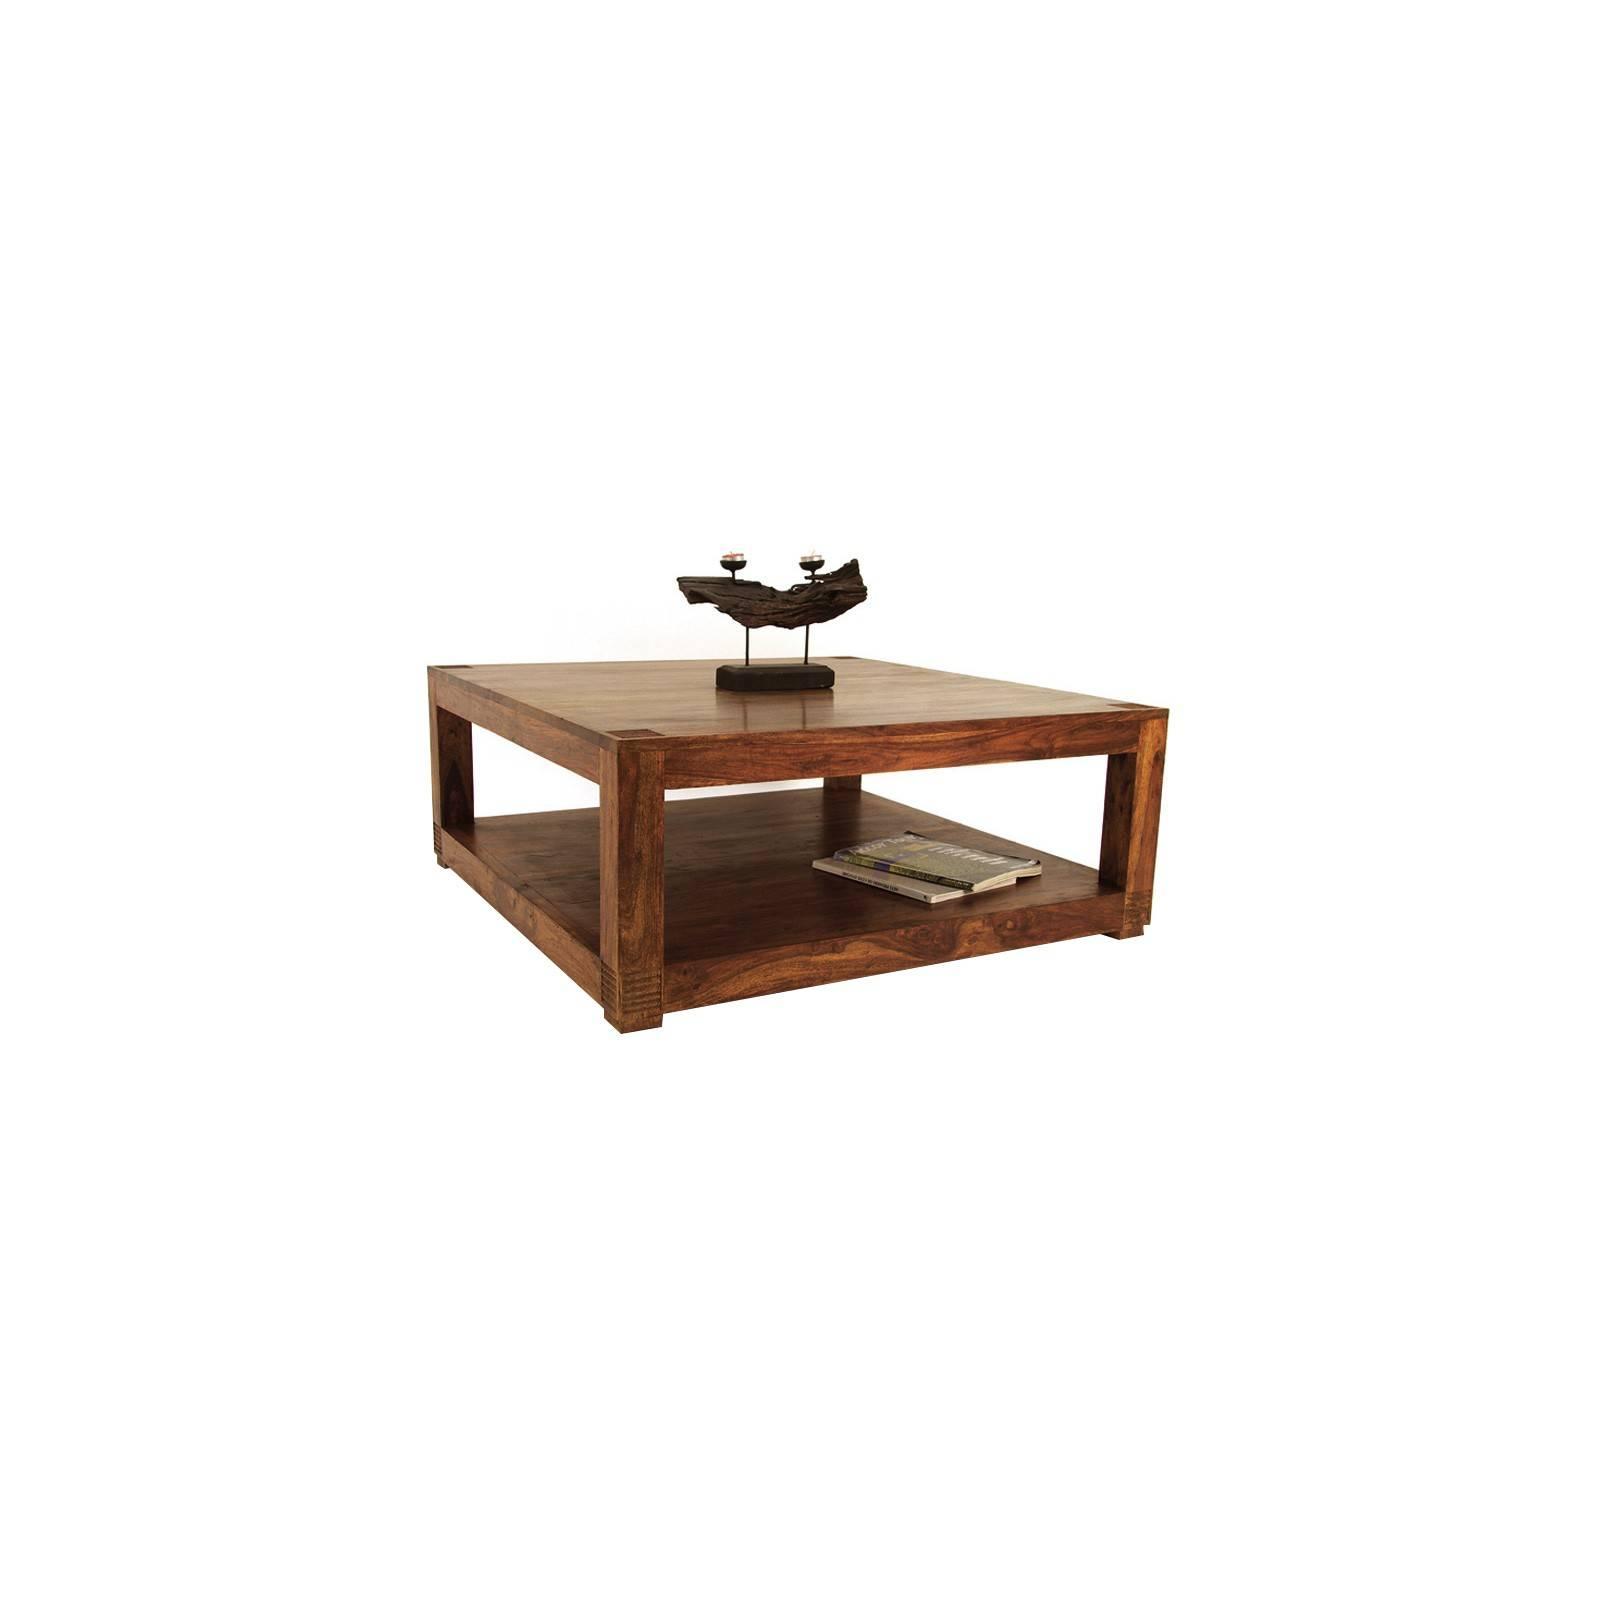 Table basse carrée au style primitif. Inspiration africaine